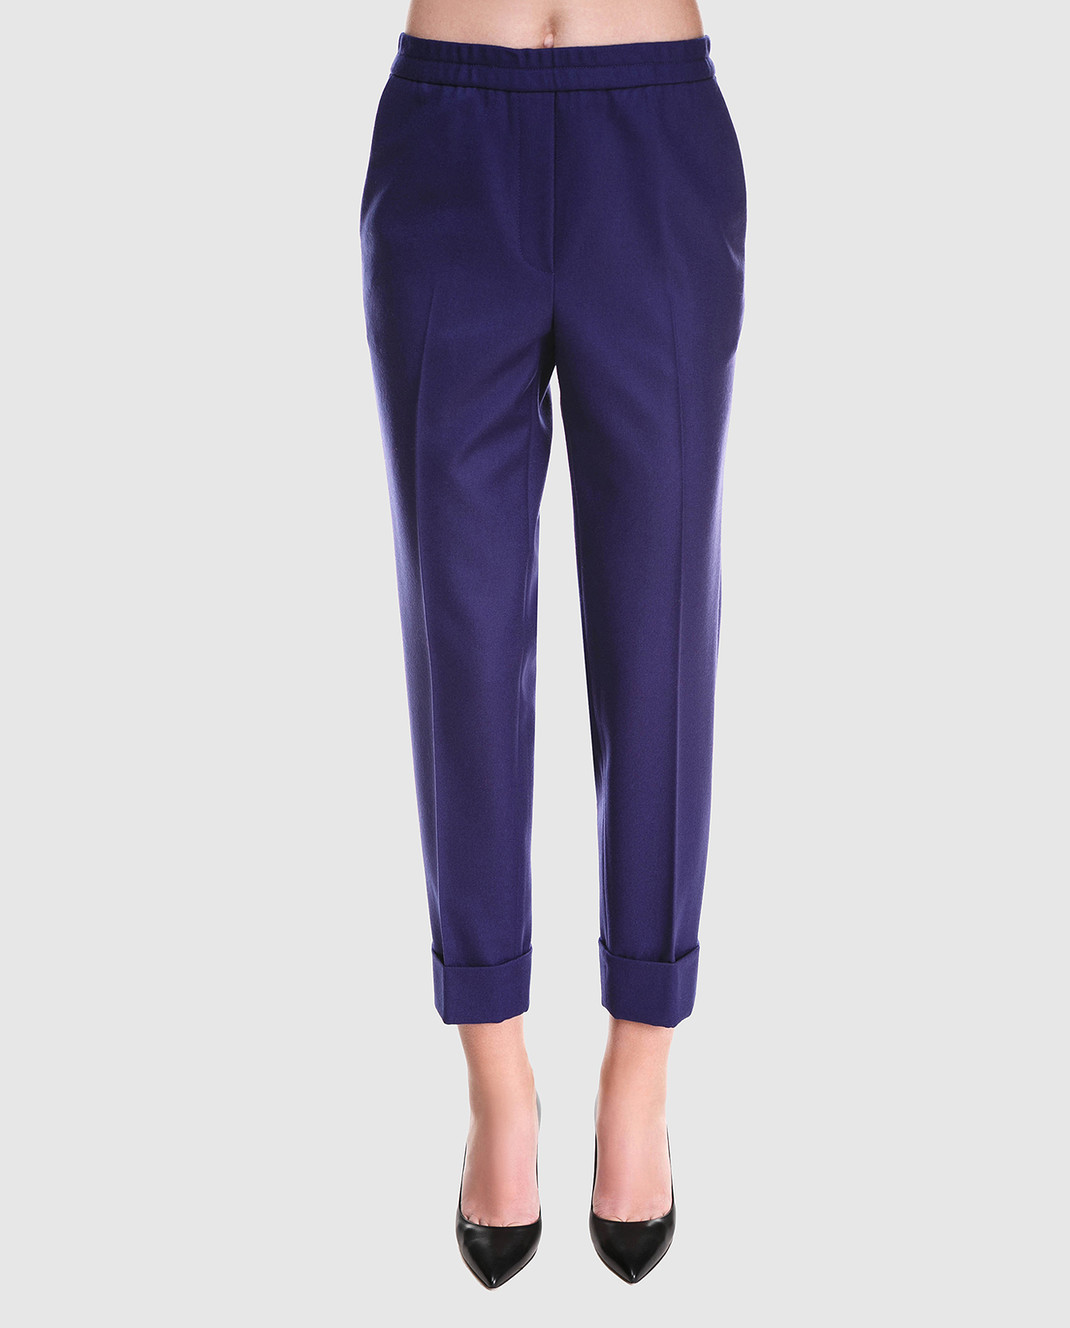 Bottega Veneta Синие брюки 513214 изображение 3